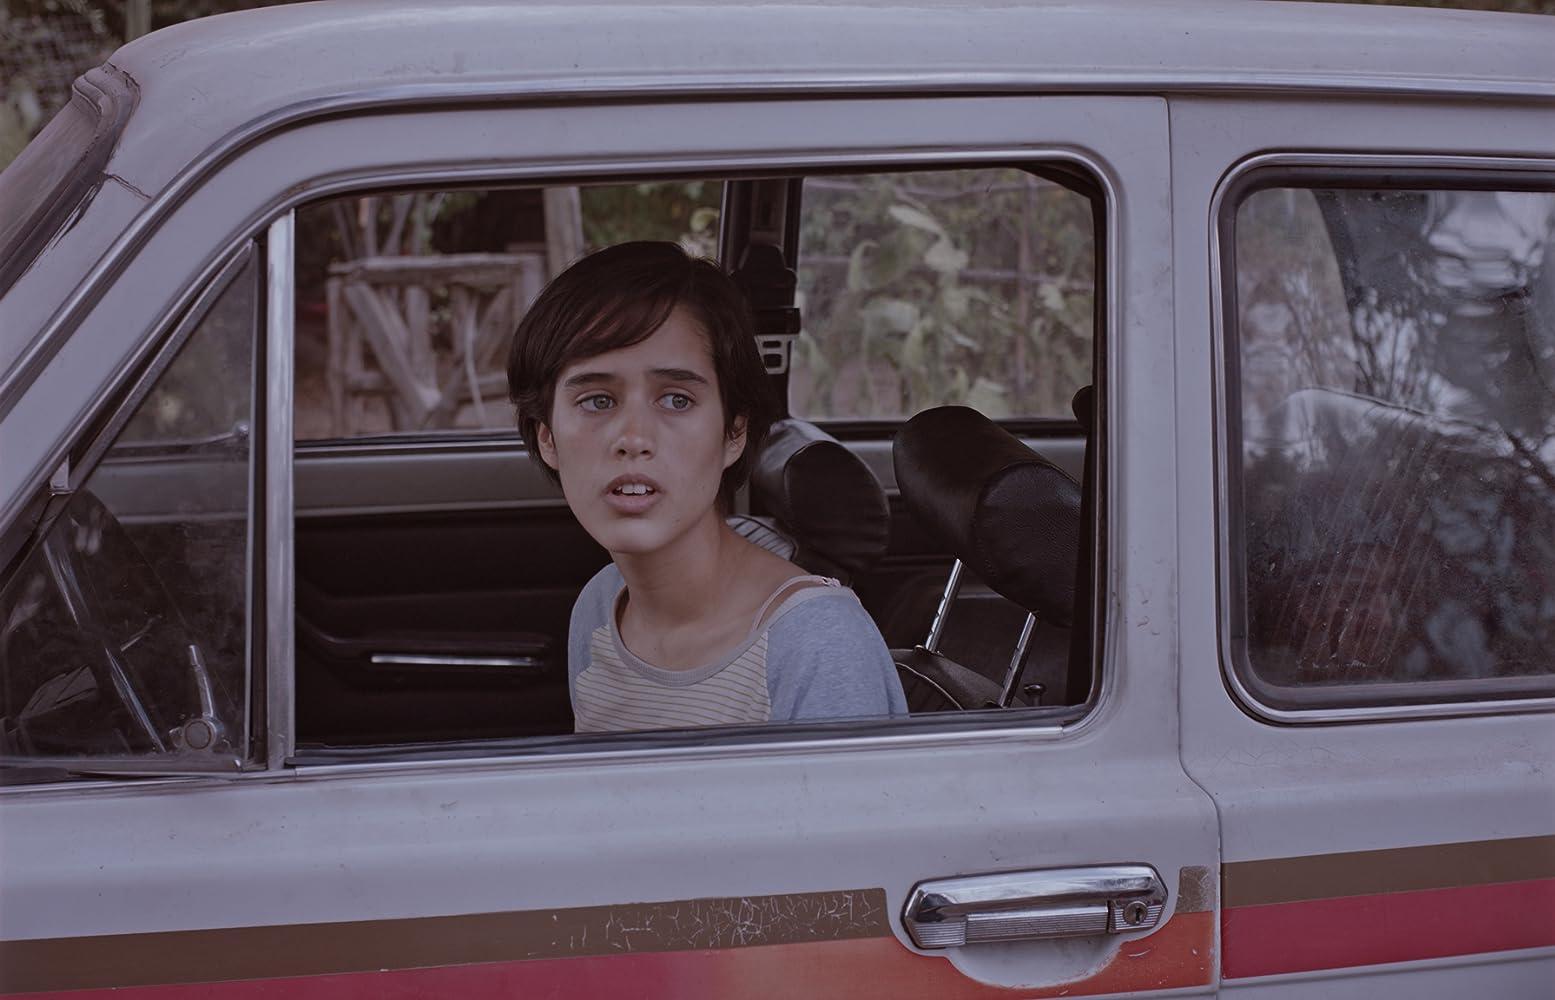 Demian Hernández in Tarde Para Morir Joven (2018)